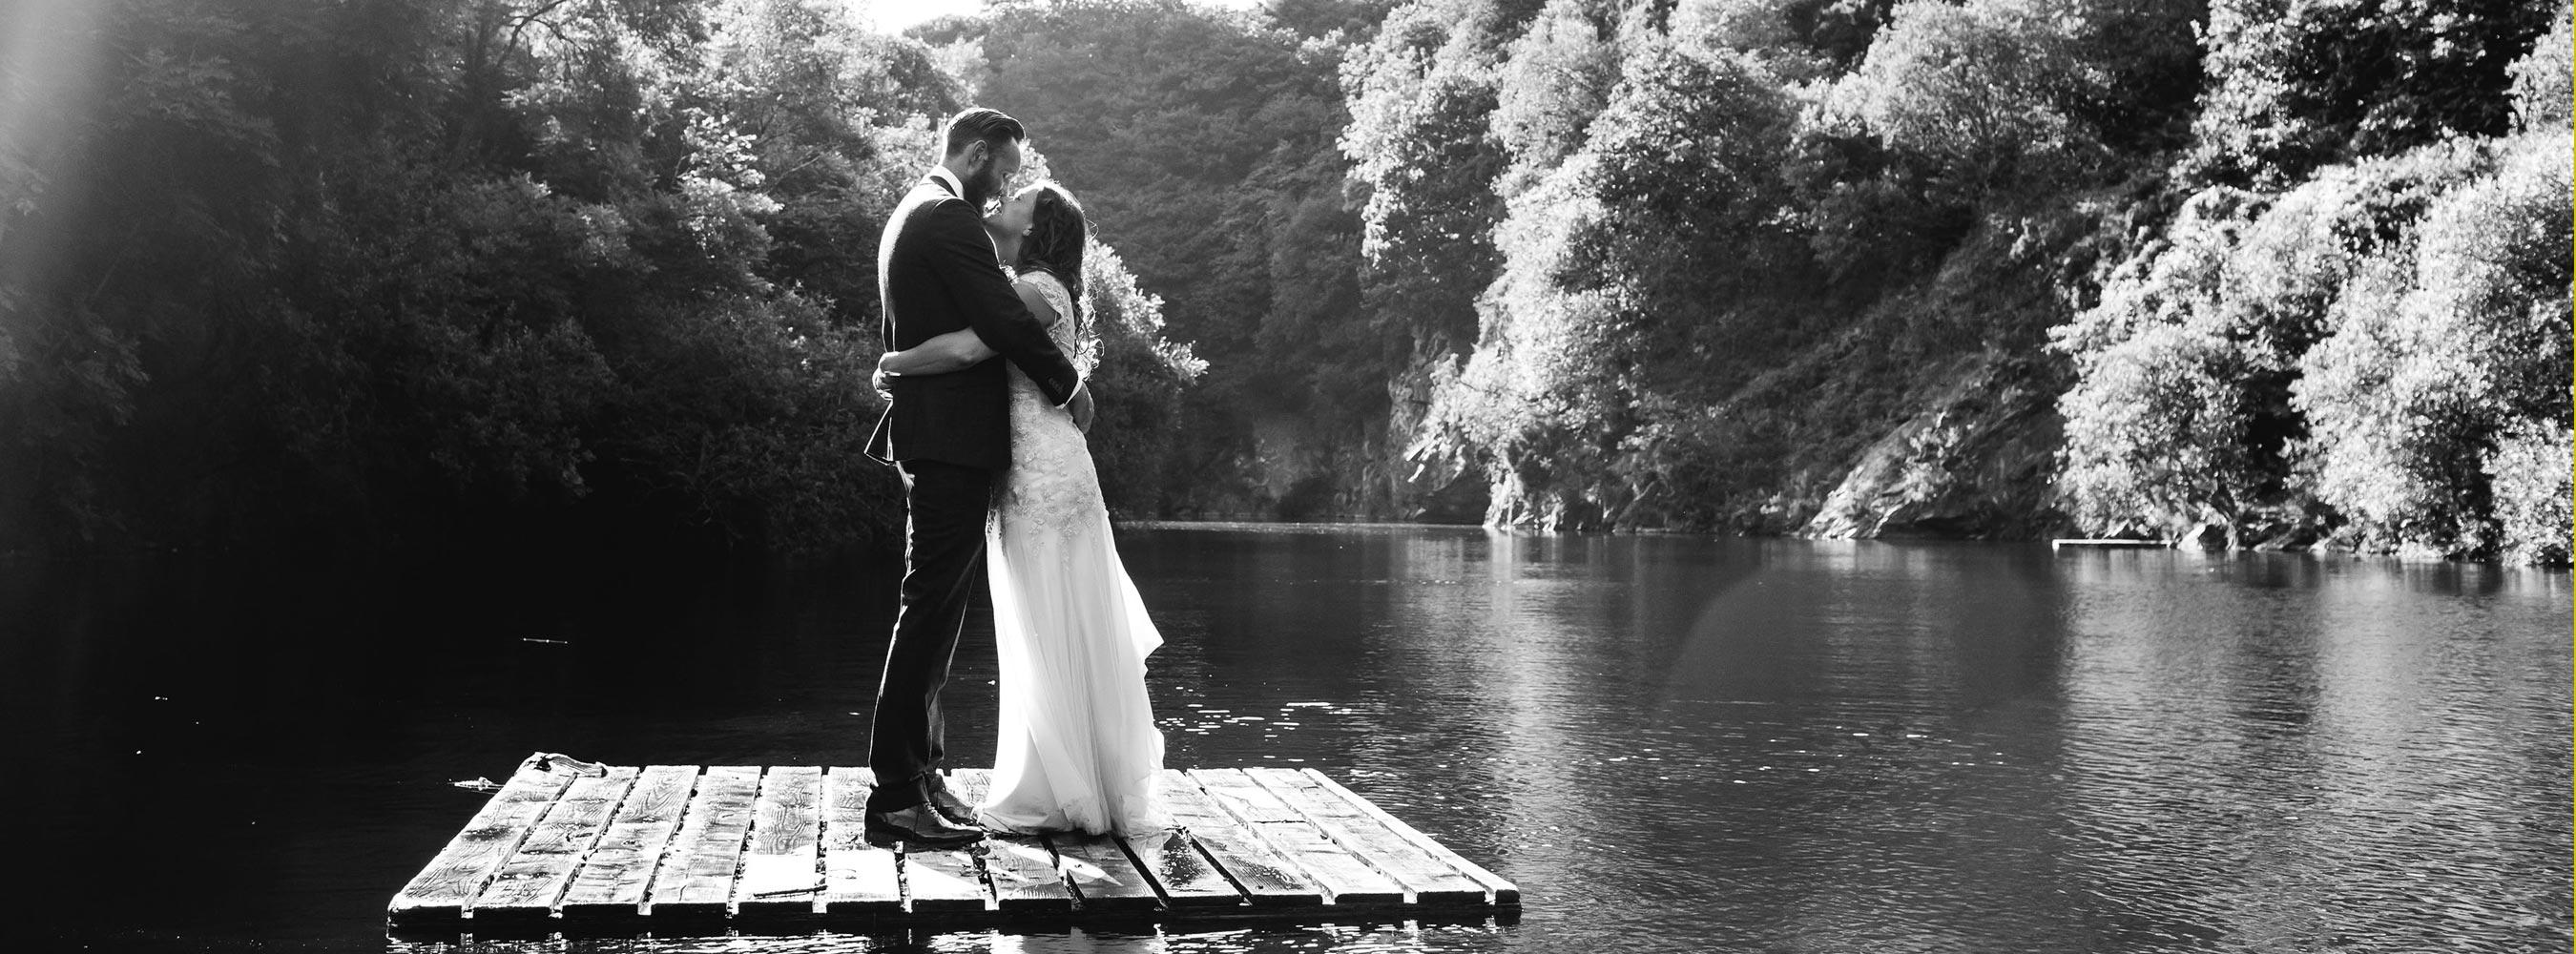 Bride and Groom floating on lake